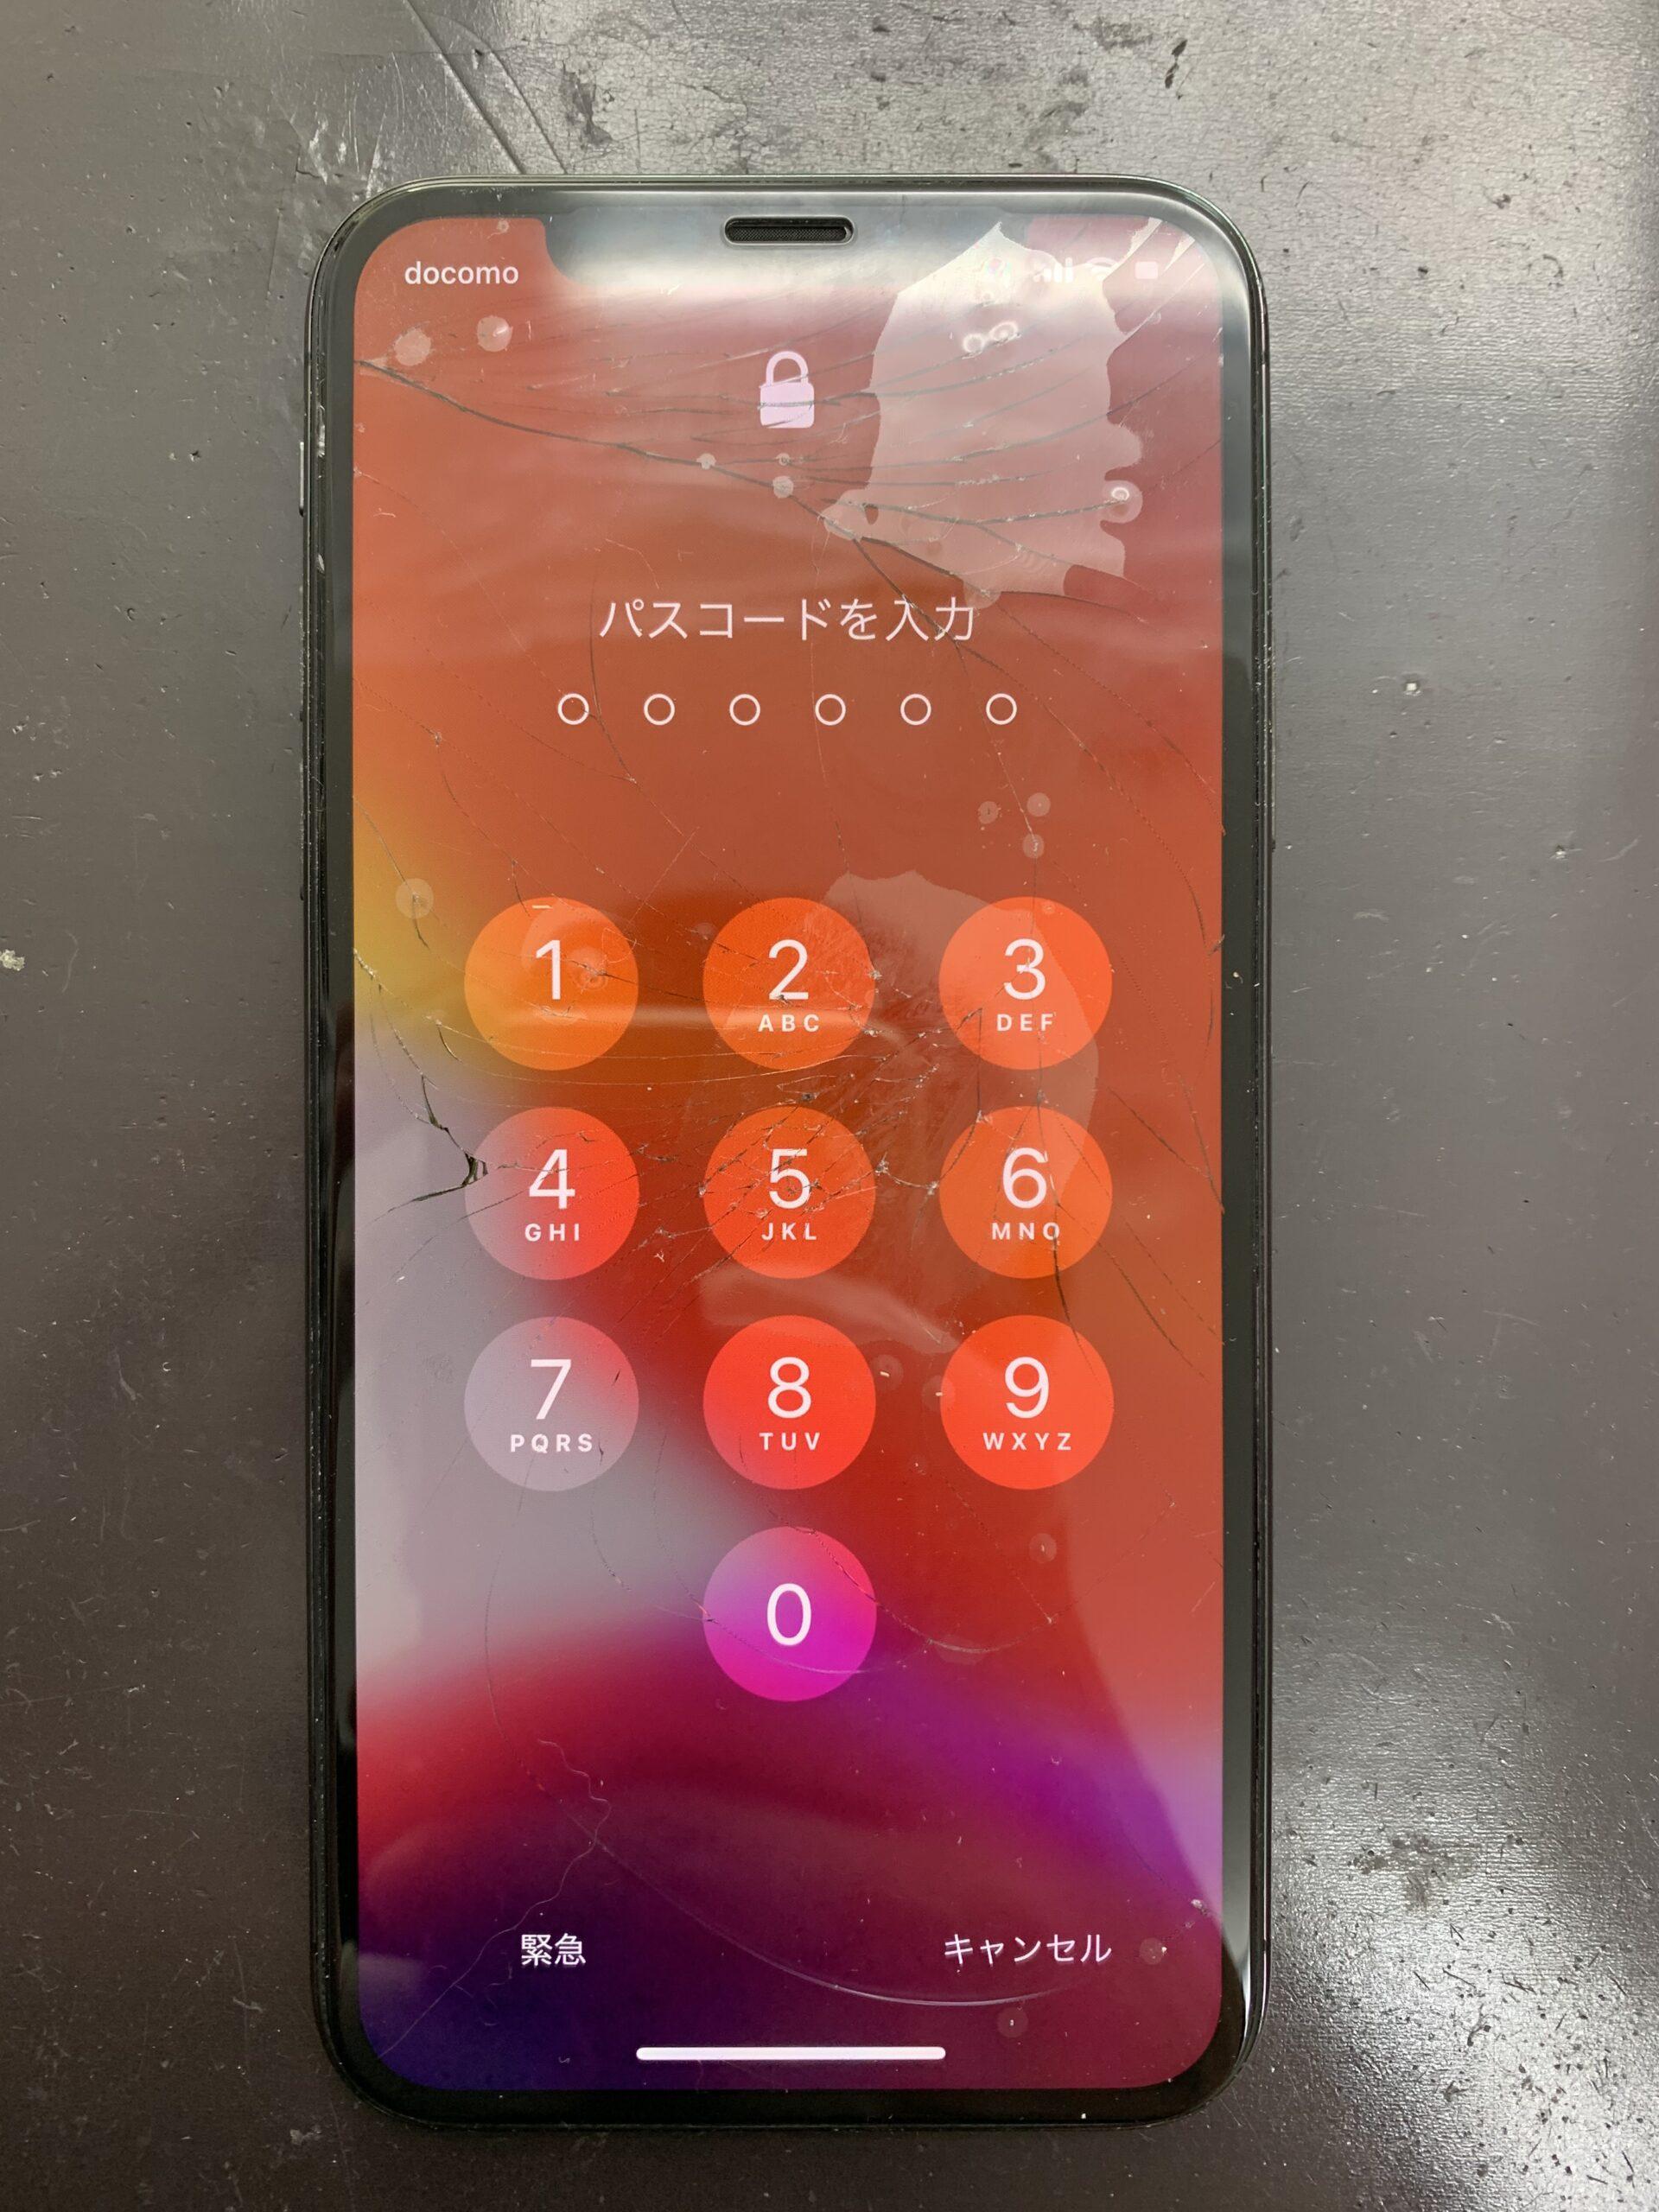 iPhoneXの画面が割れても修理をすれば綺麗になります!即日修理でデータもそのままなので安心です!